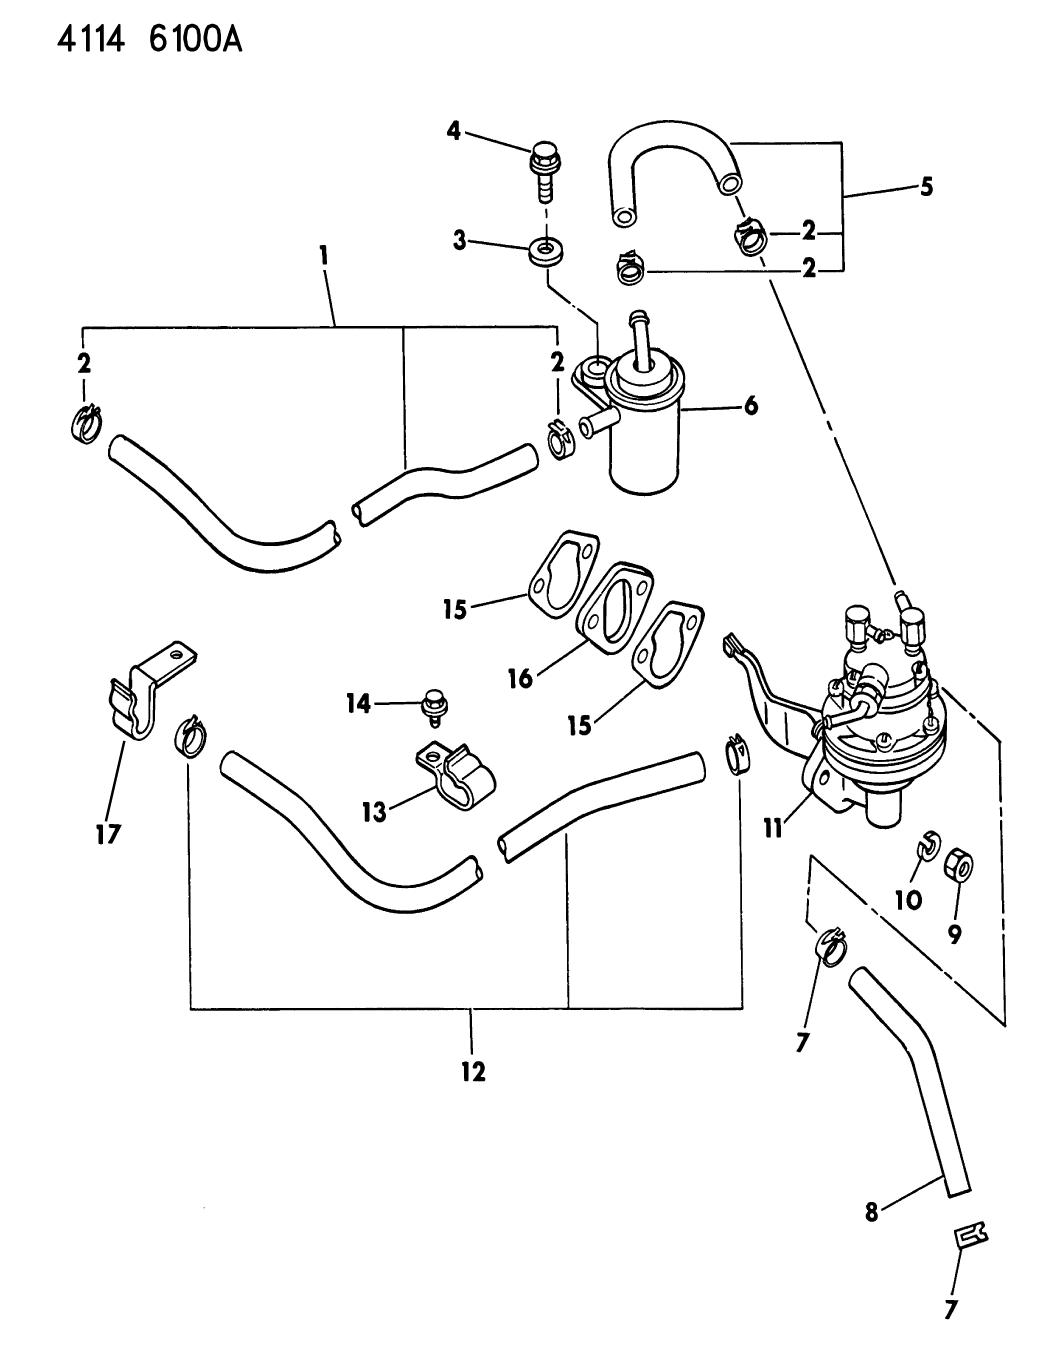 4397736 Genuine Mopar Filter Fuel Purch Asm 1984 Chrysler Lebaron Pump